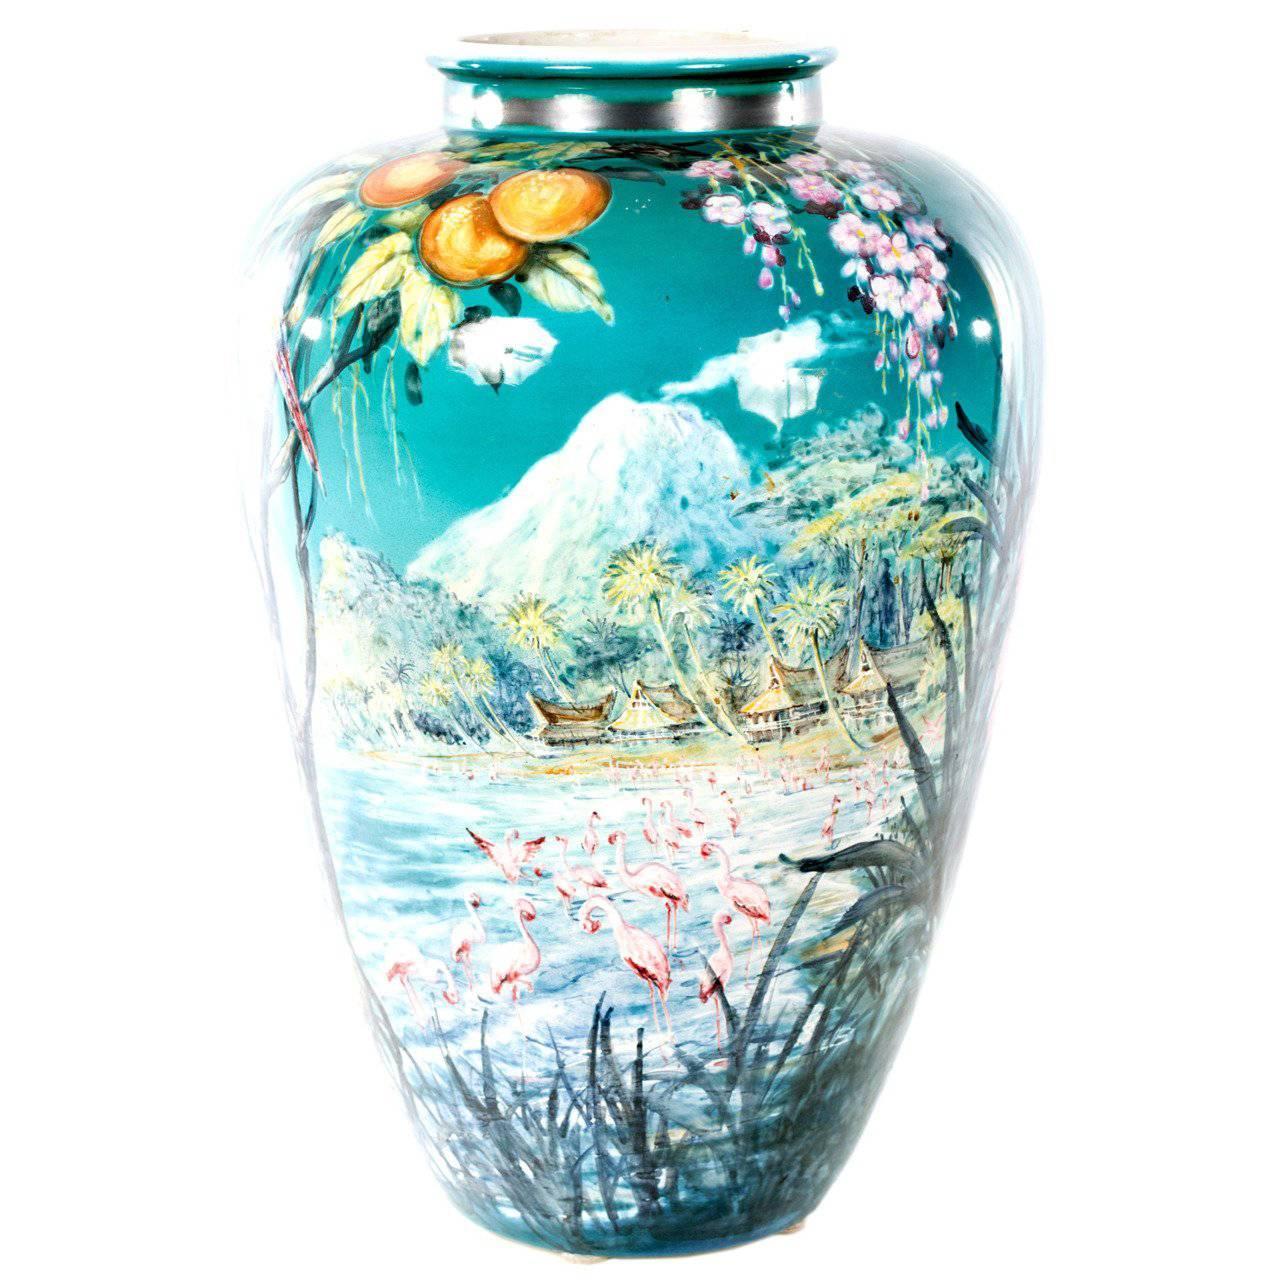 Colorful German Baluster Vase by Ulmer Keramik